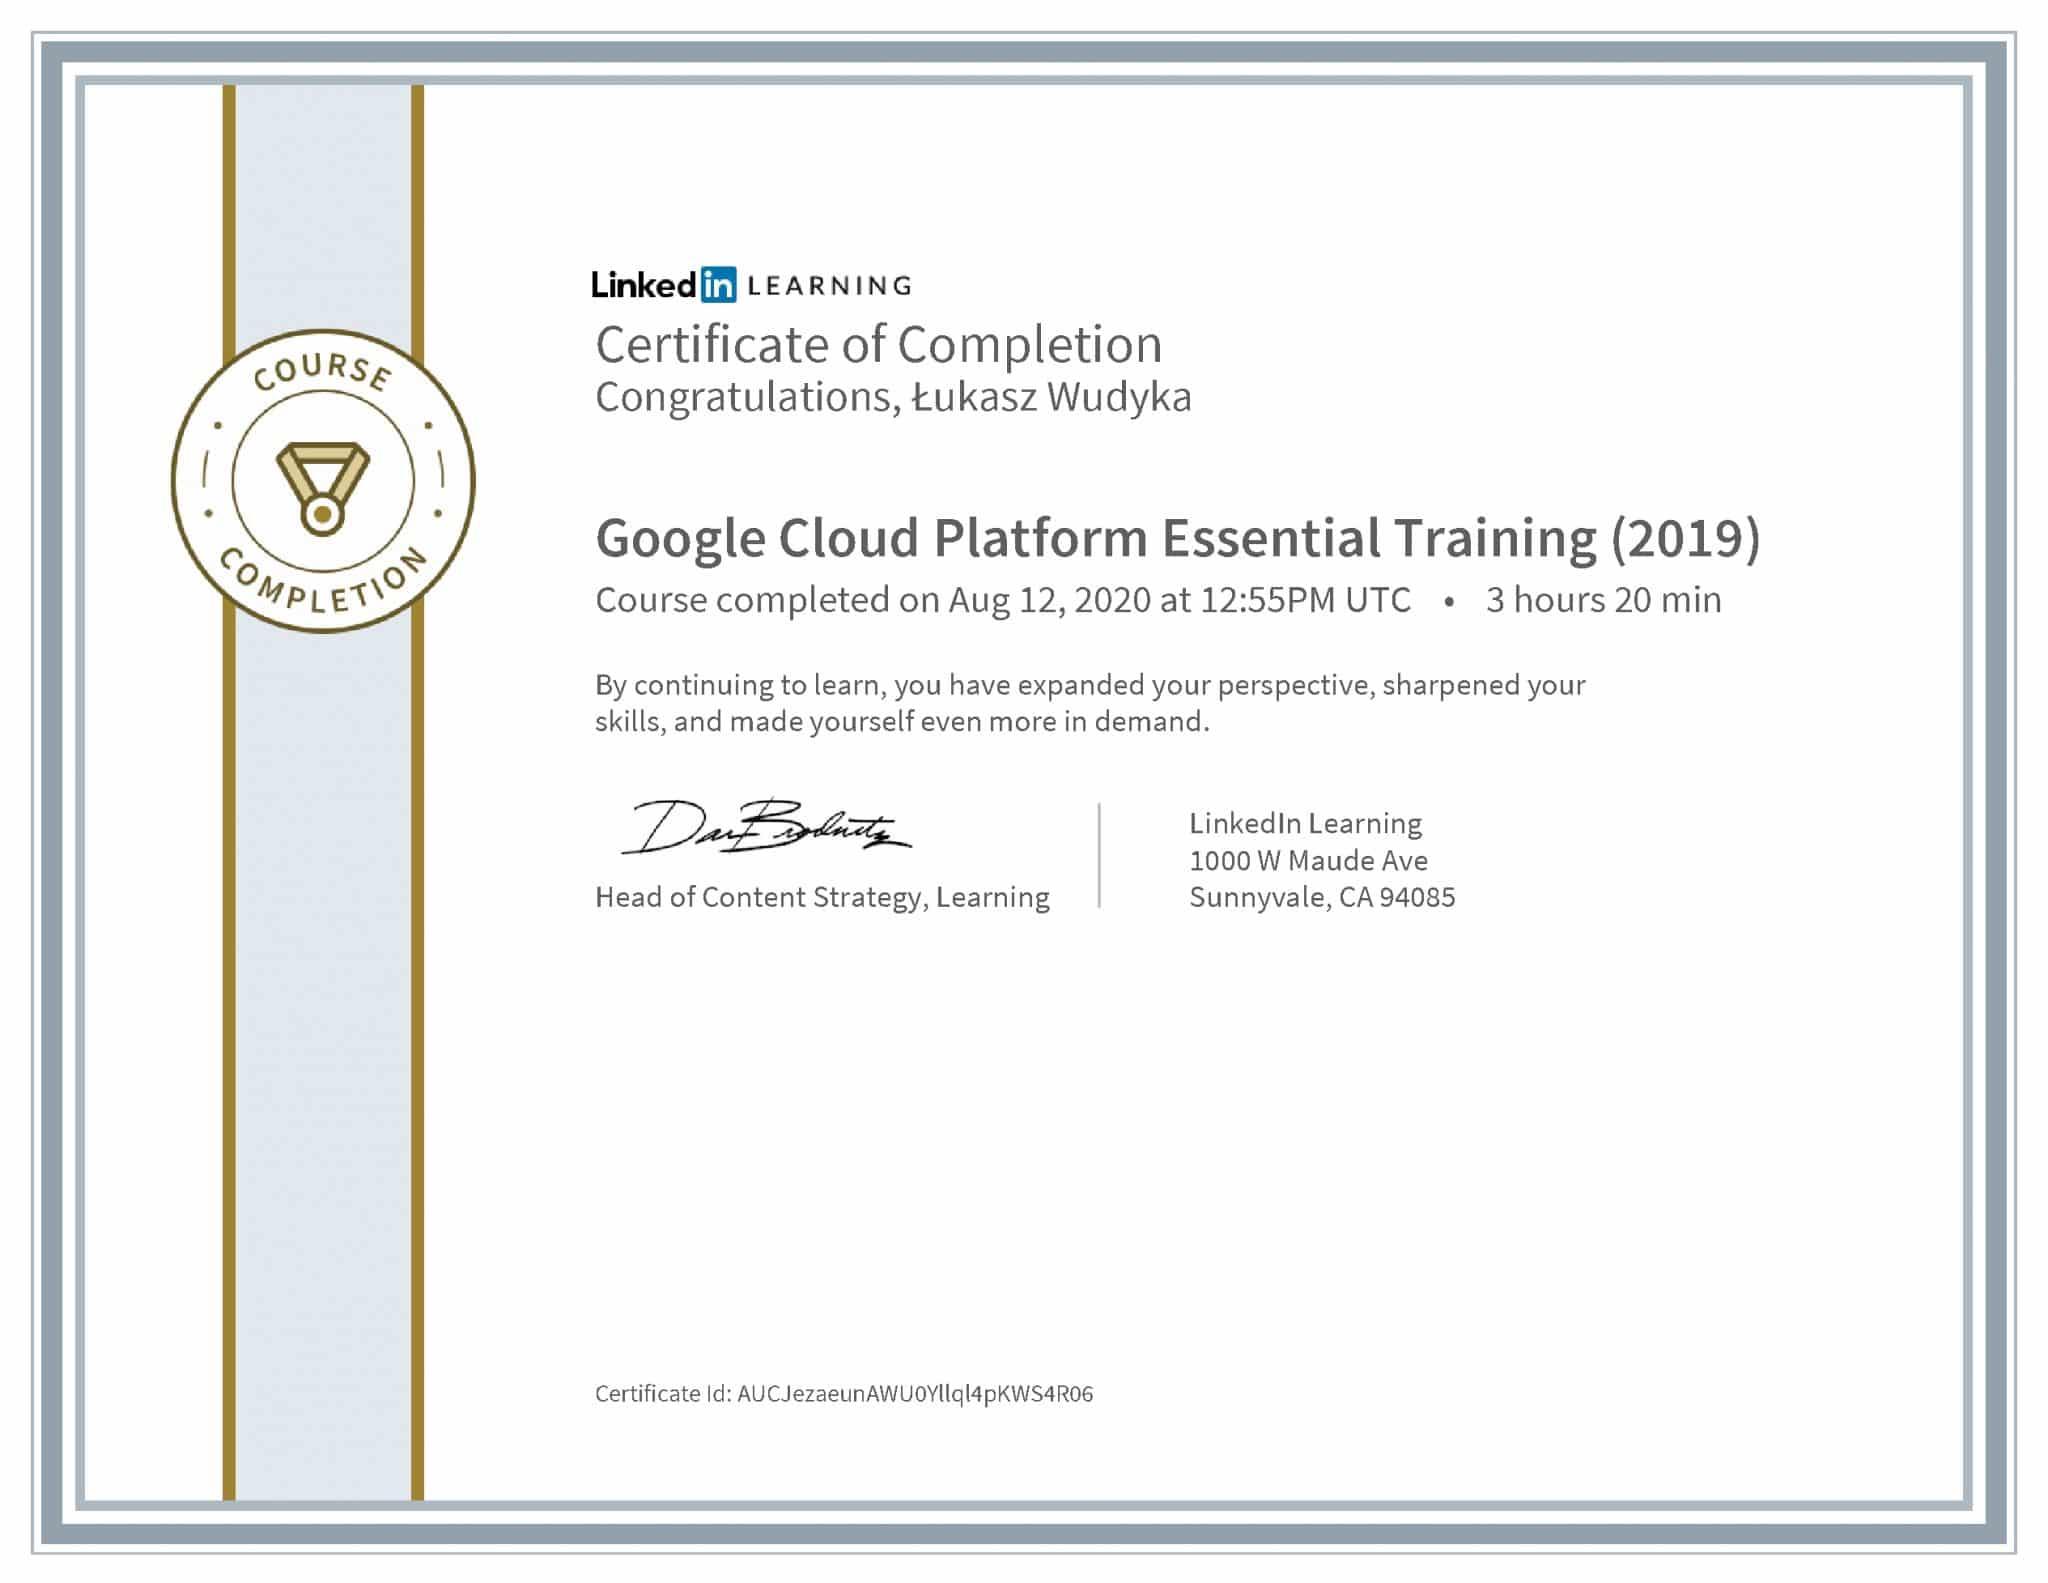 Łukasz Wudyka certyfikat LinkedIn Google Cloud Platform Essential Training (2019)